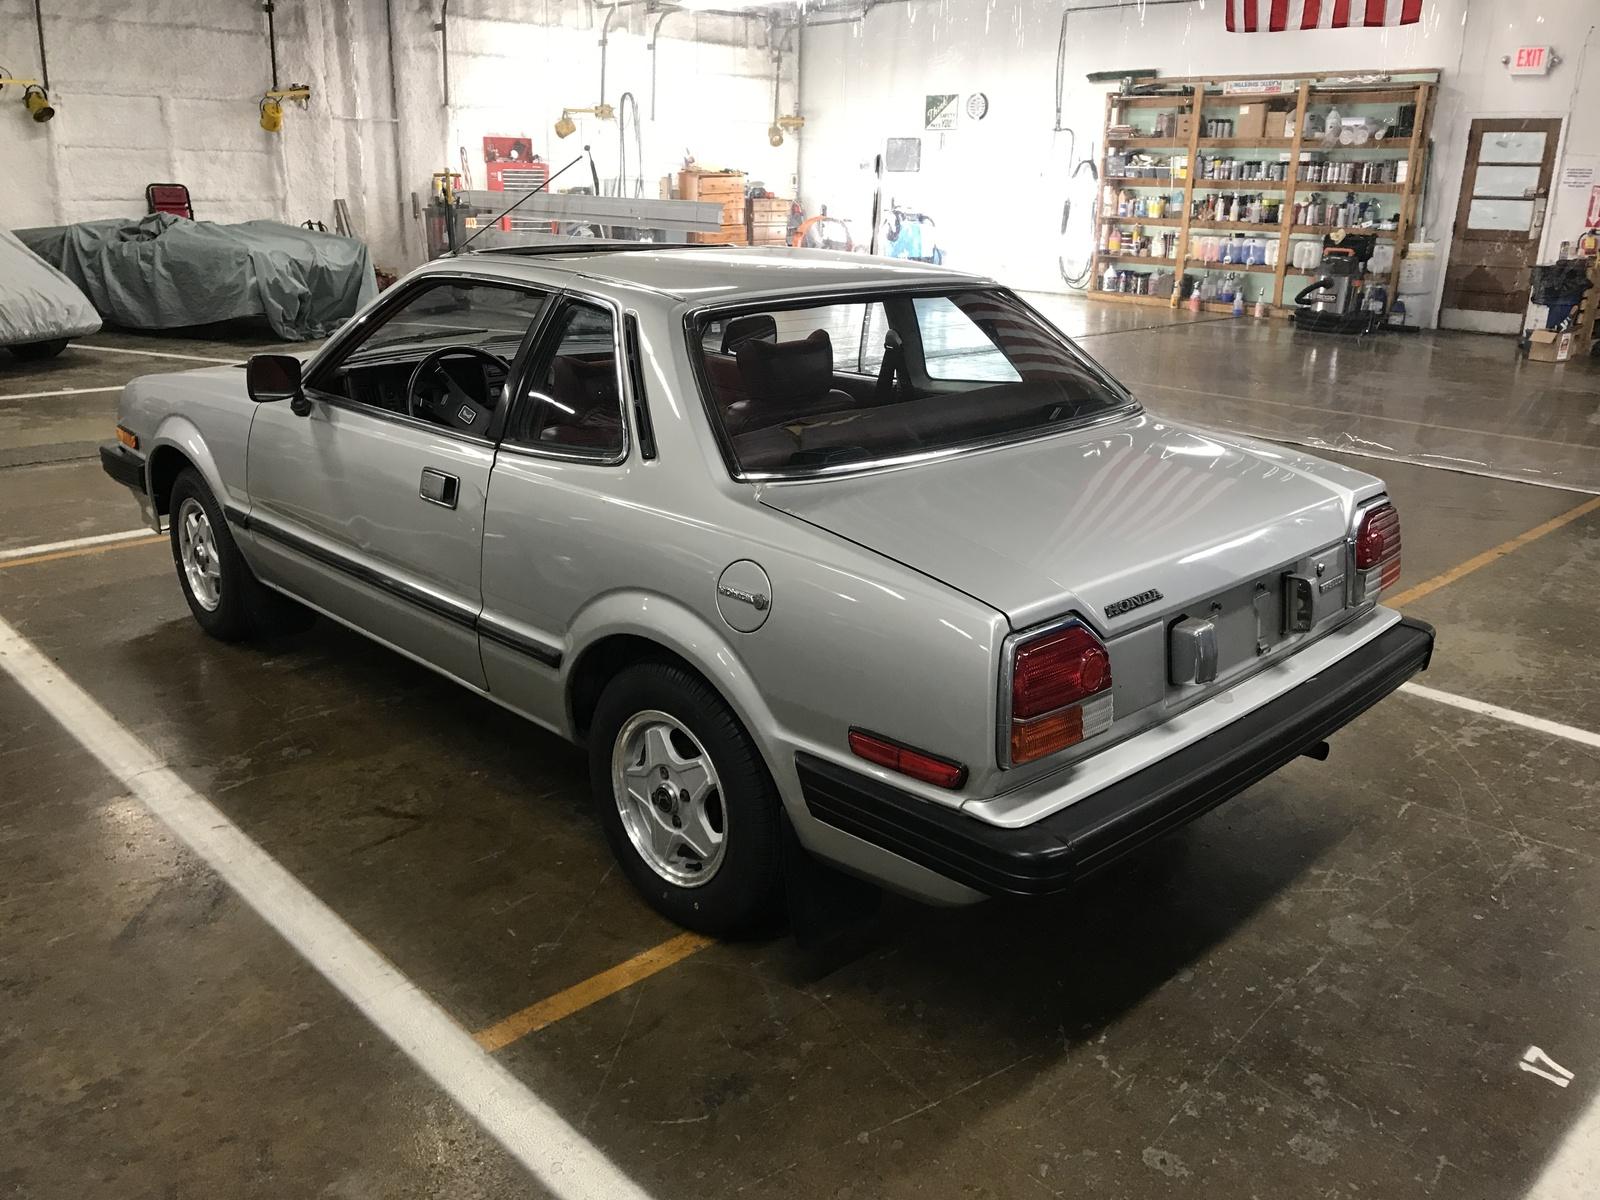 Subaru 0 Financing >> 1979 Honda Prelude - Overview - CarGurus